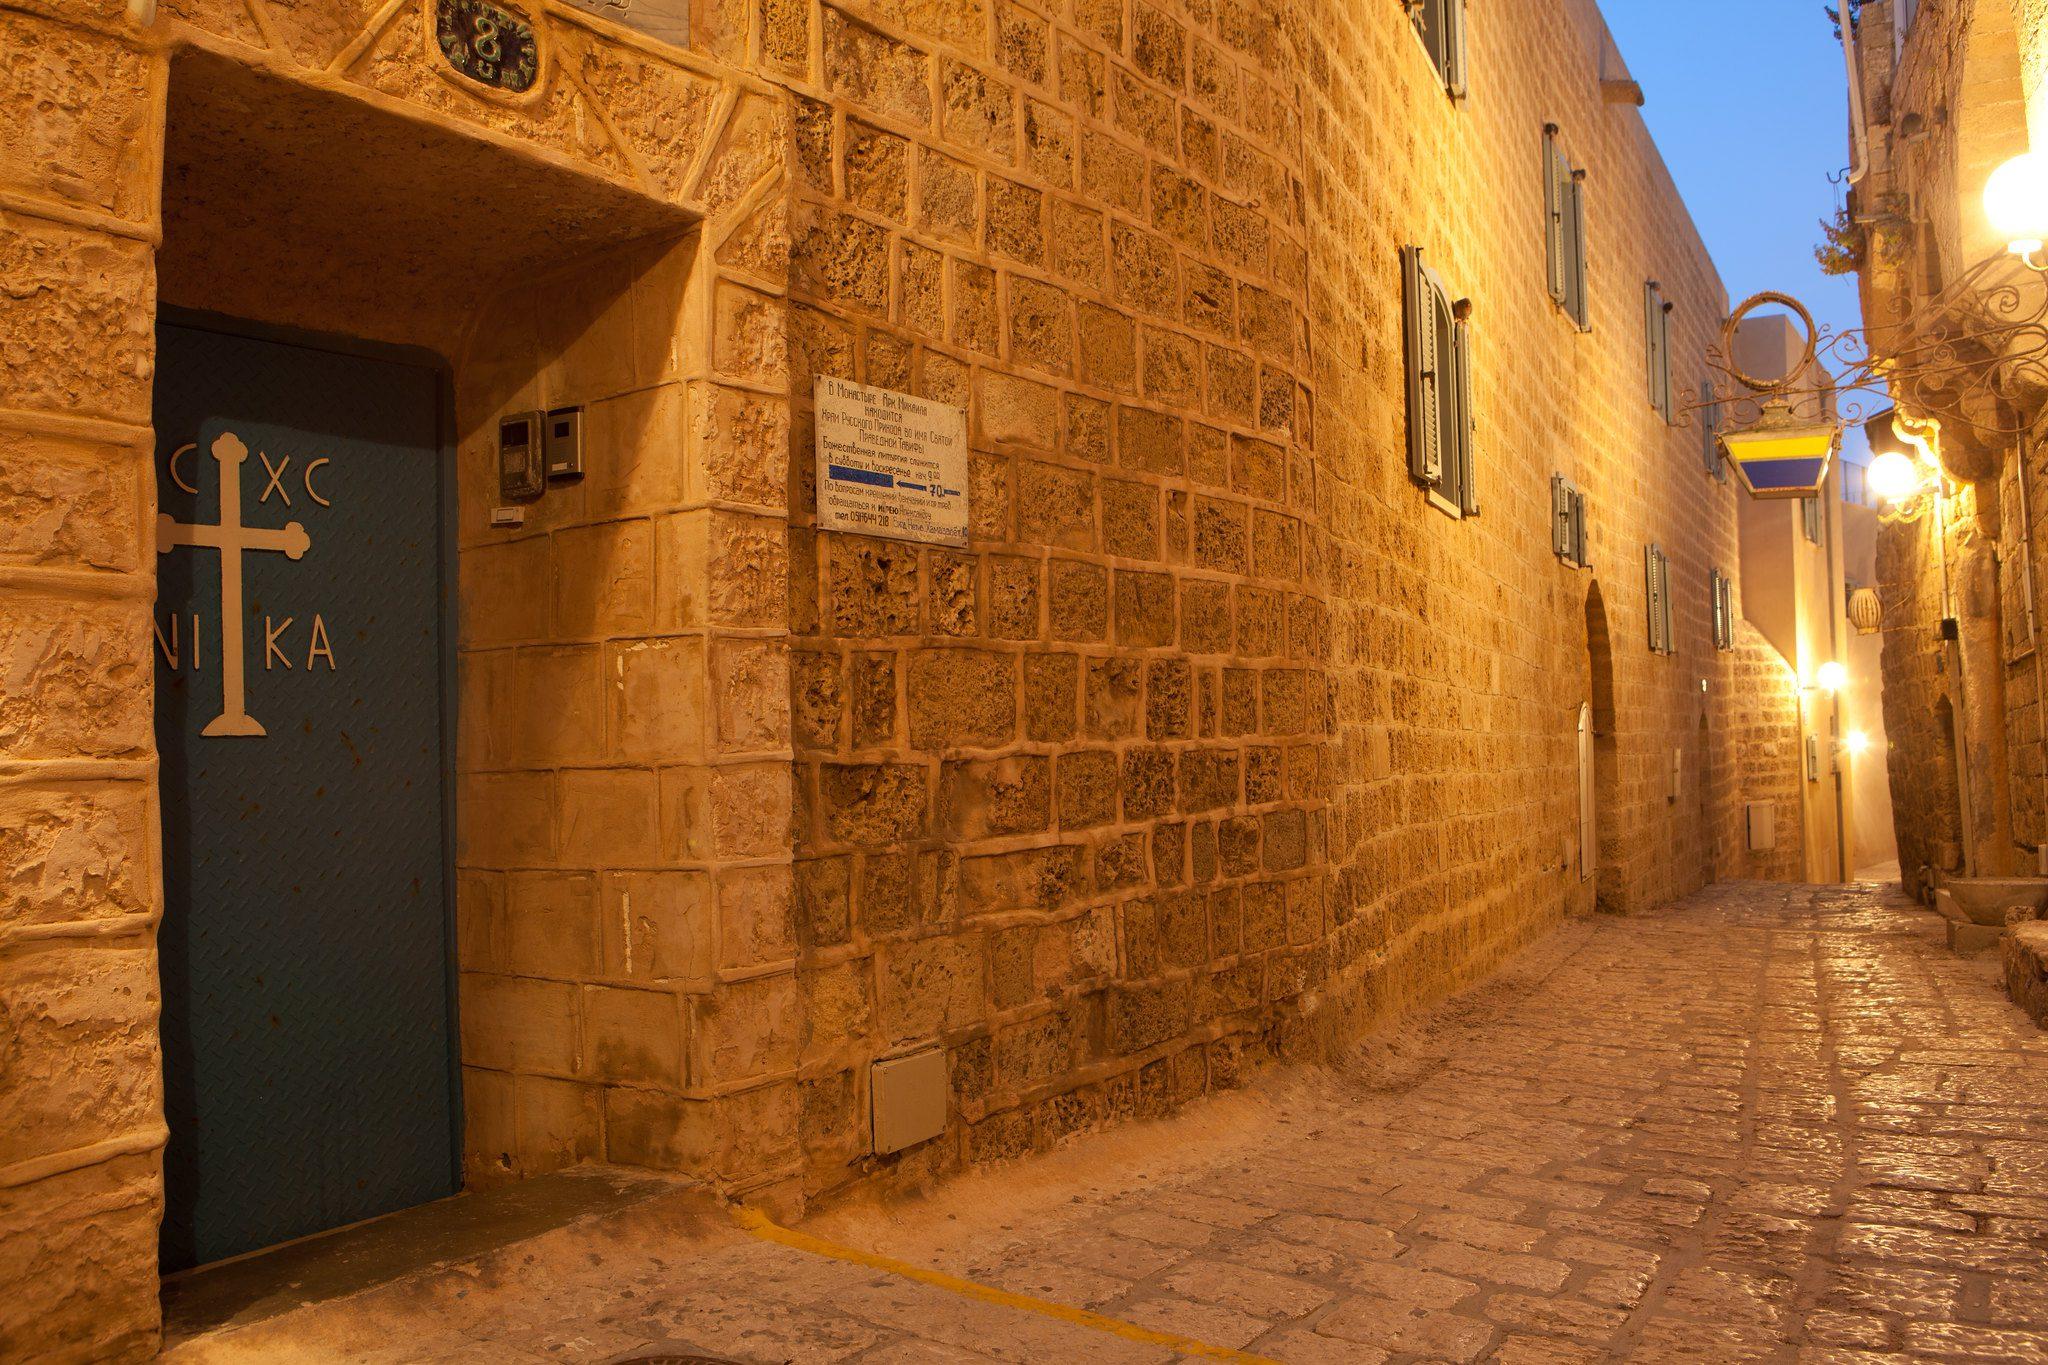 Ancient cobblestone street at sunset in Jaffa